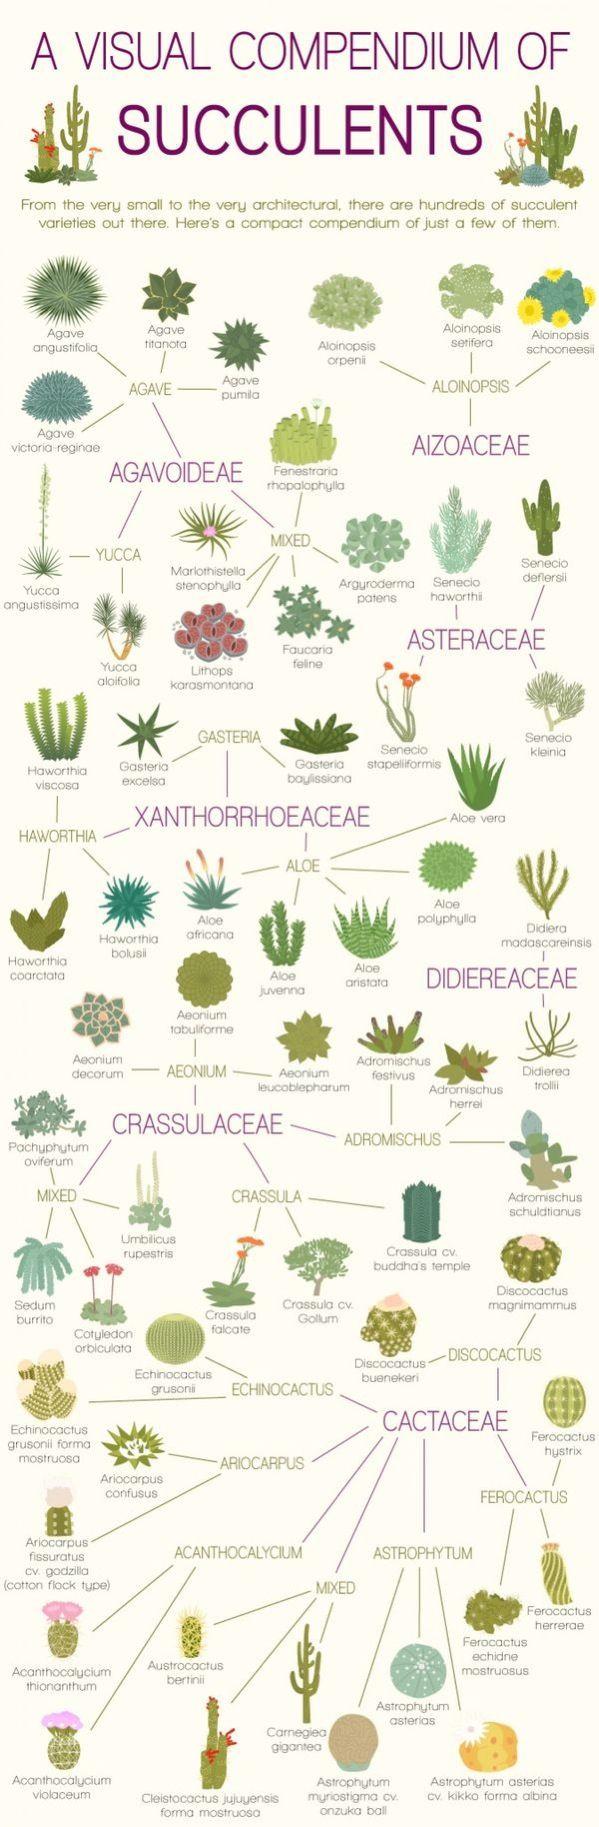 A visual compendium of succulents |